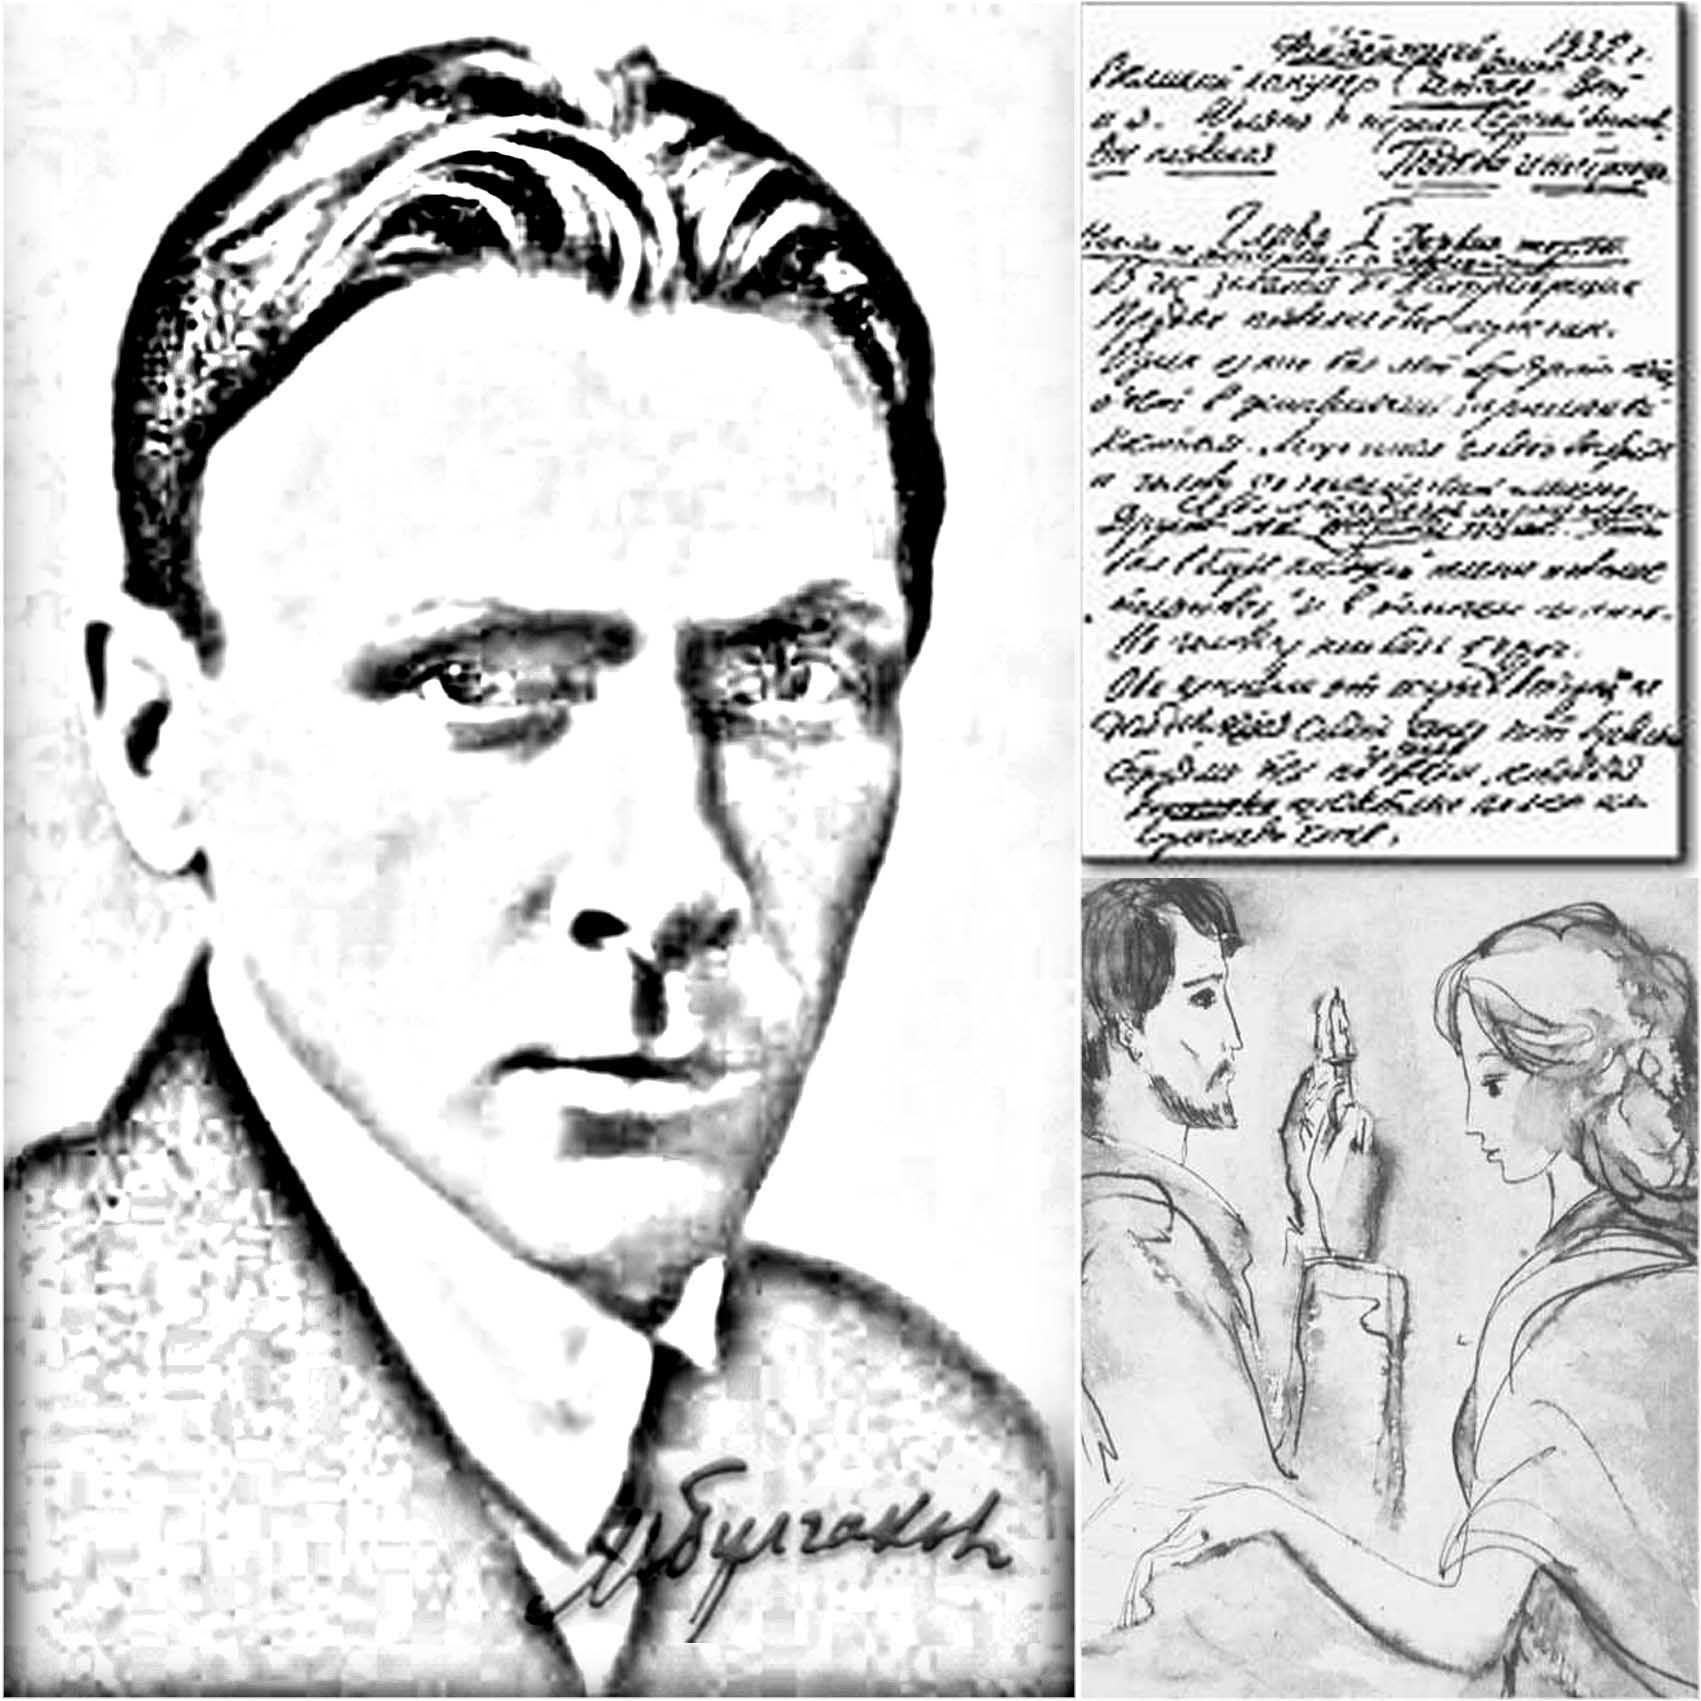 Плакат-портрет Михаила Булгакова - дизайнер arazmus555